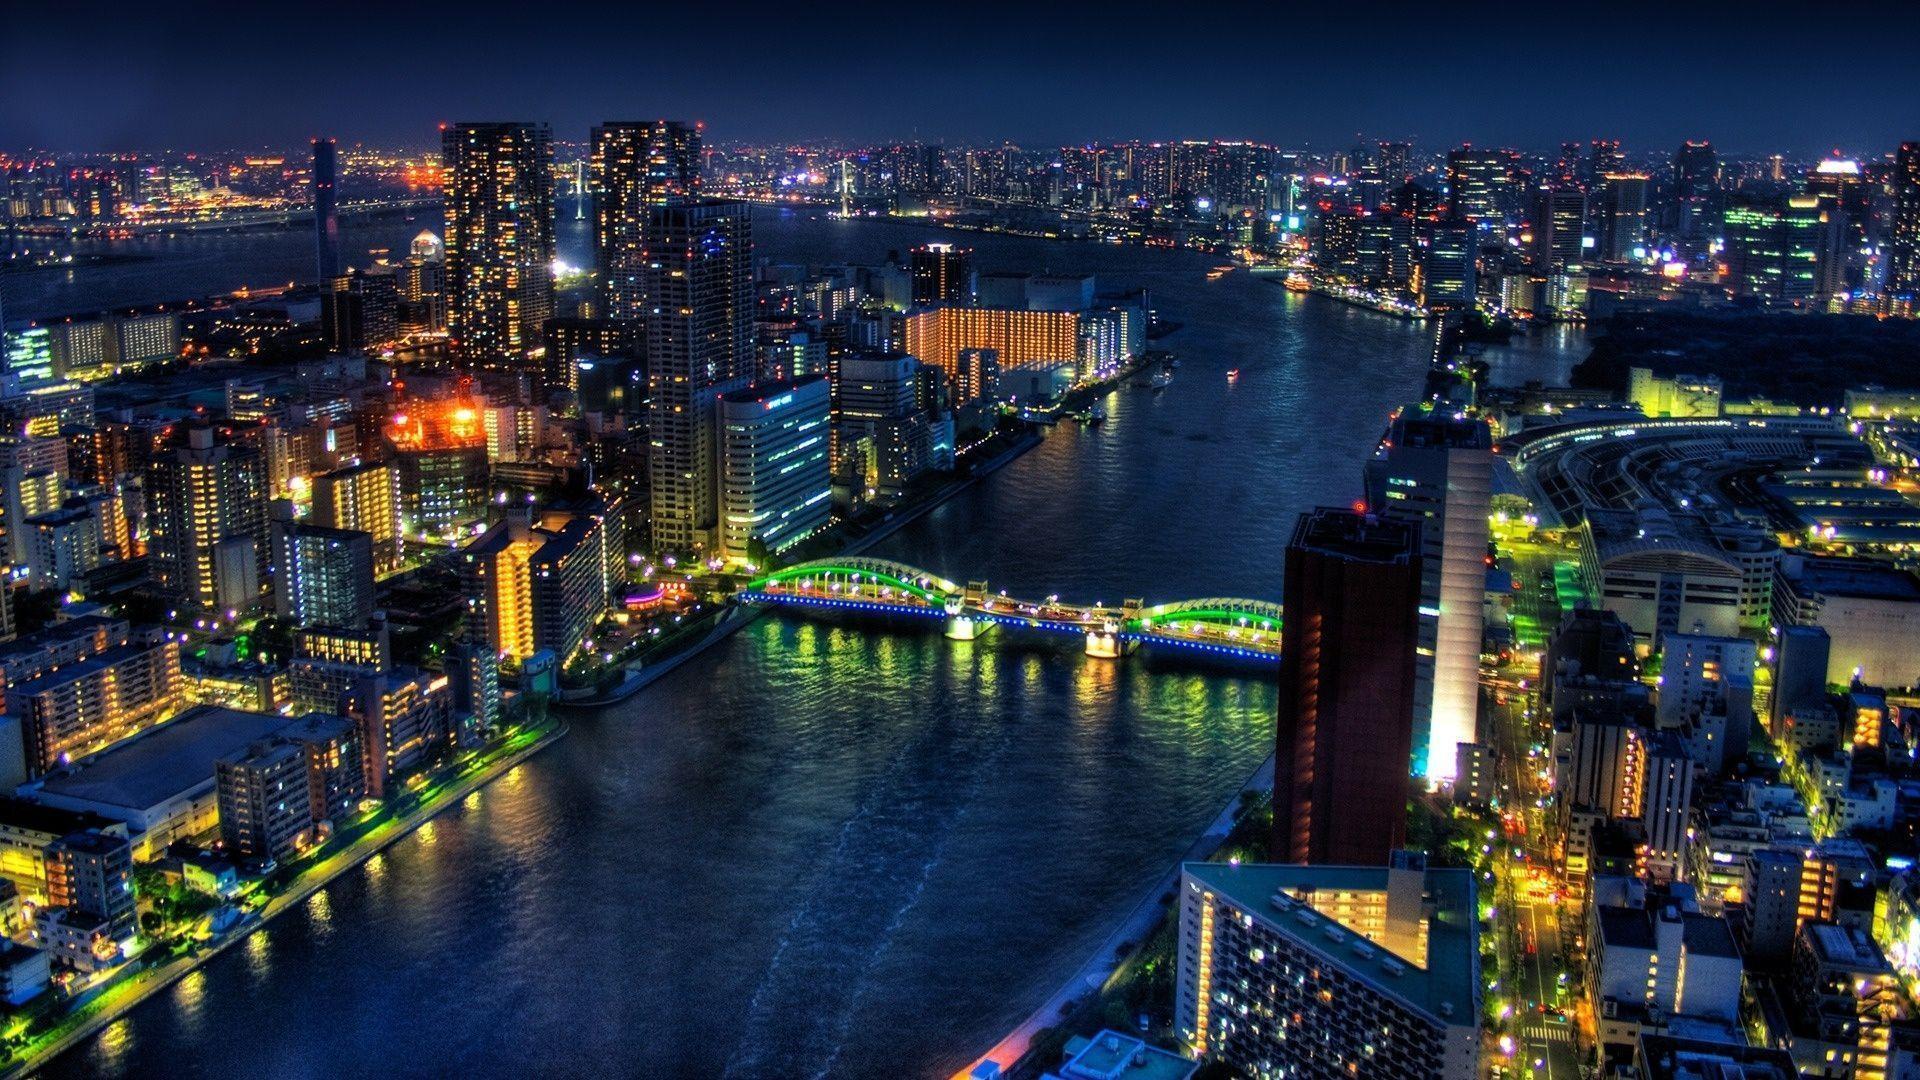 Tokyo Japan 4K Wallpapers - Top Free Tokyo Japan 4K Backgrounds